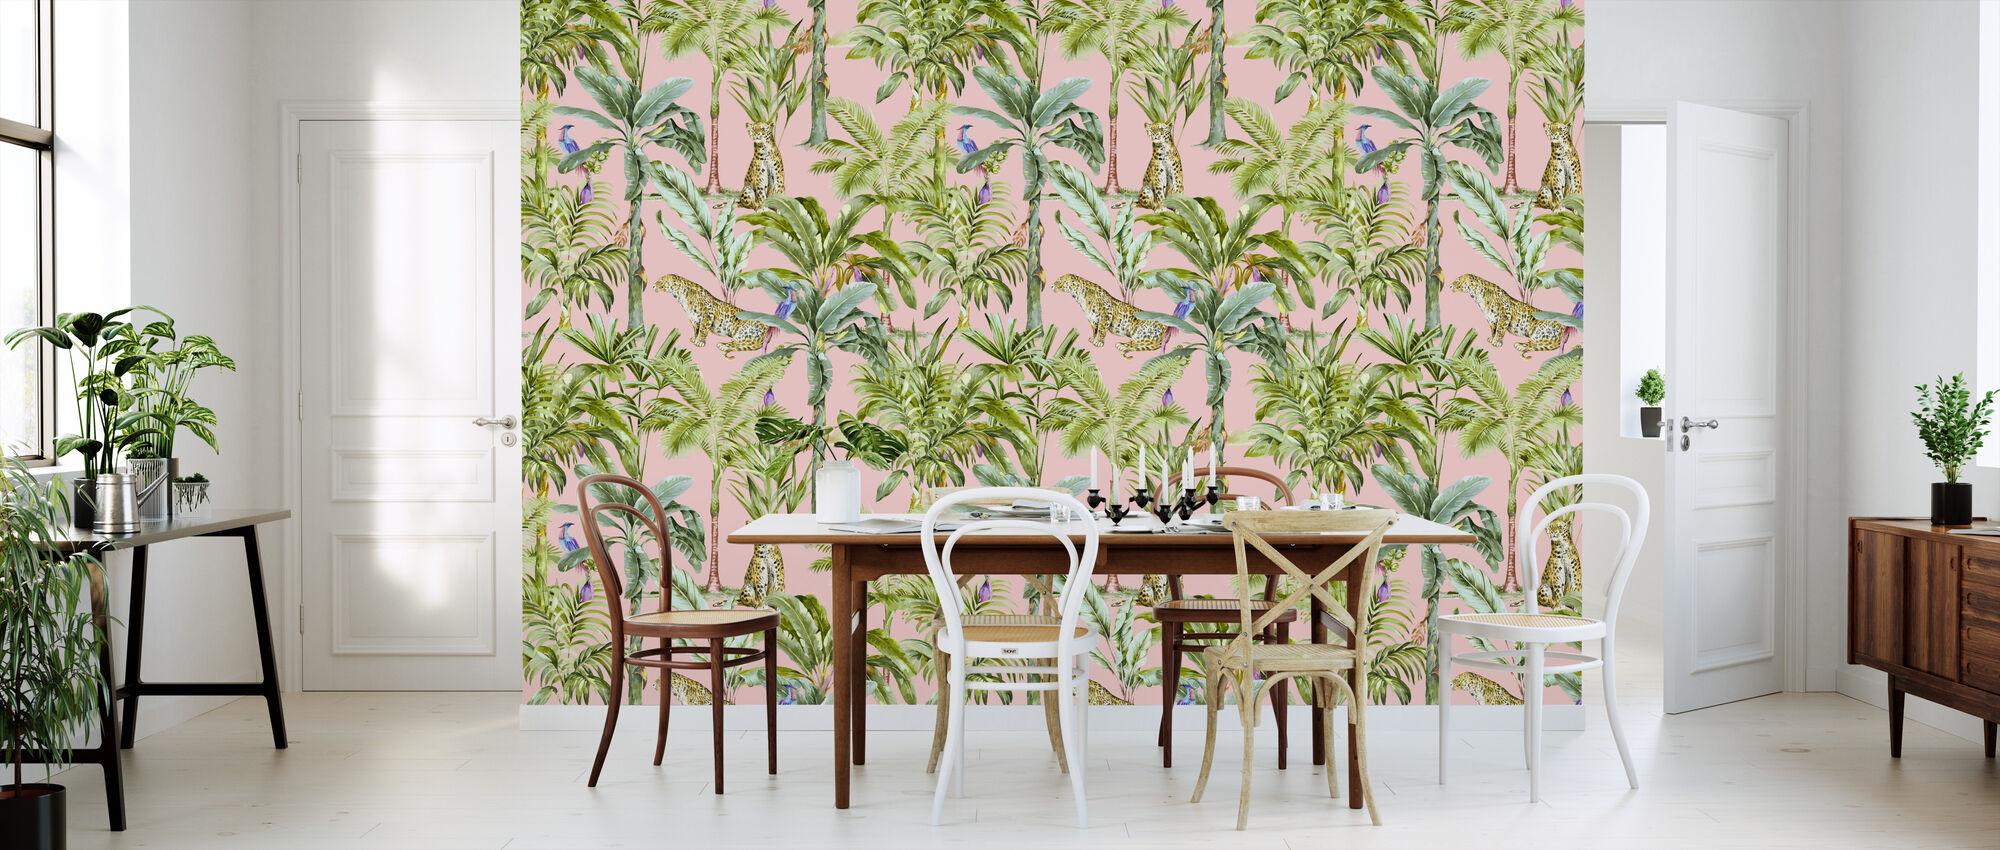 Tropical Jungle Tutorial - Rosa - Papel pintado - Cocina